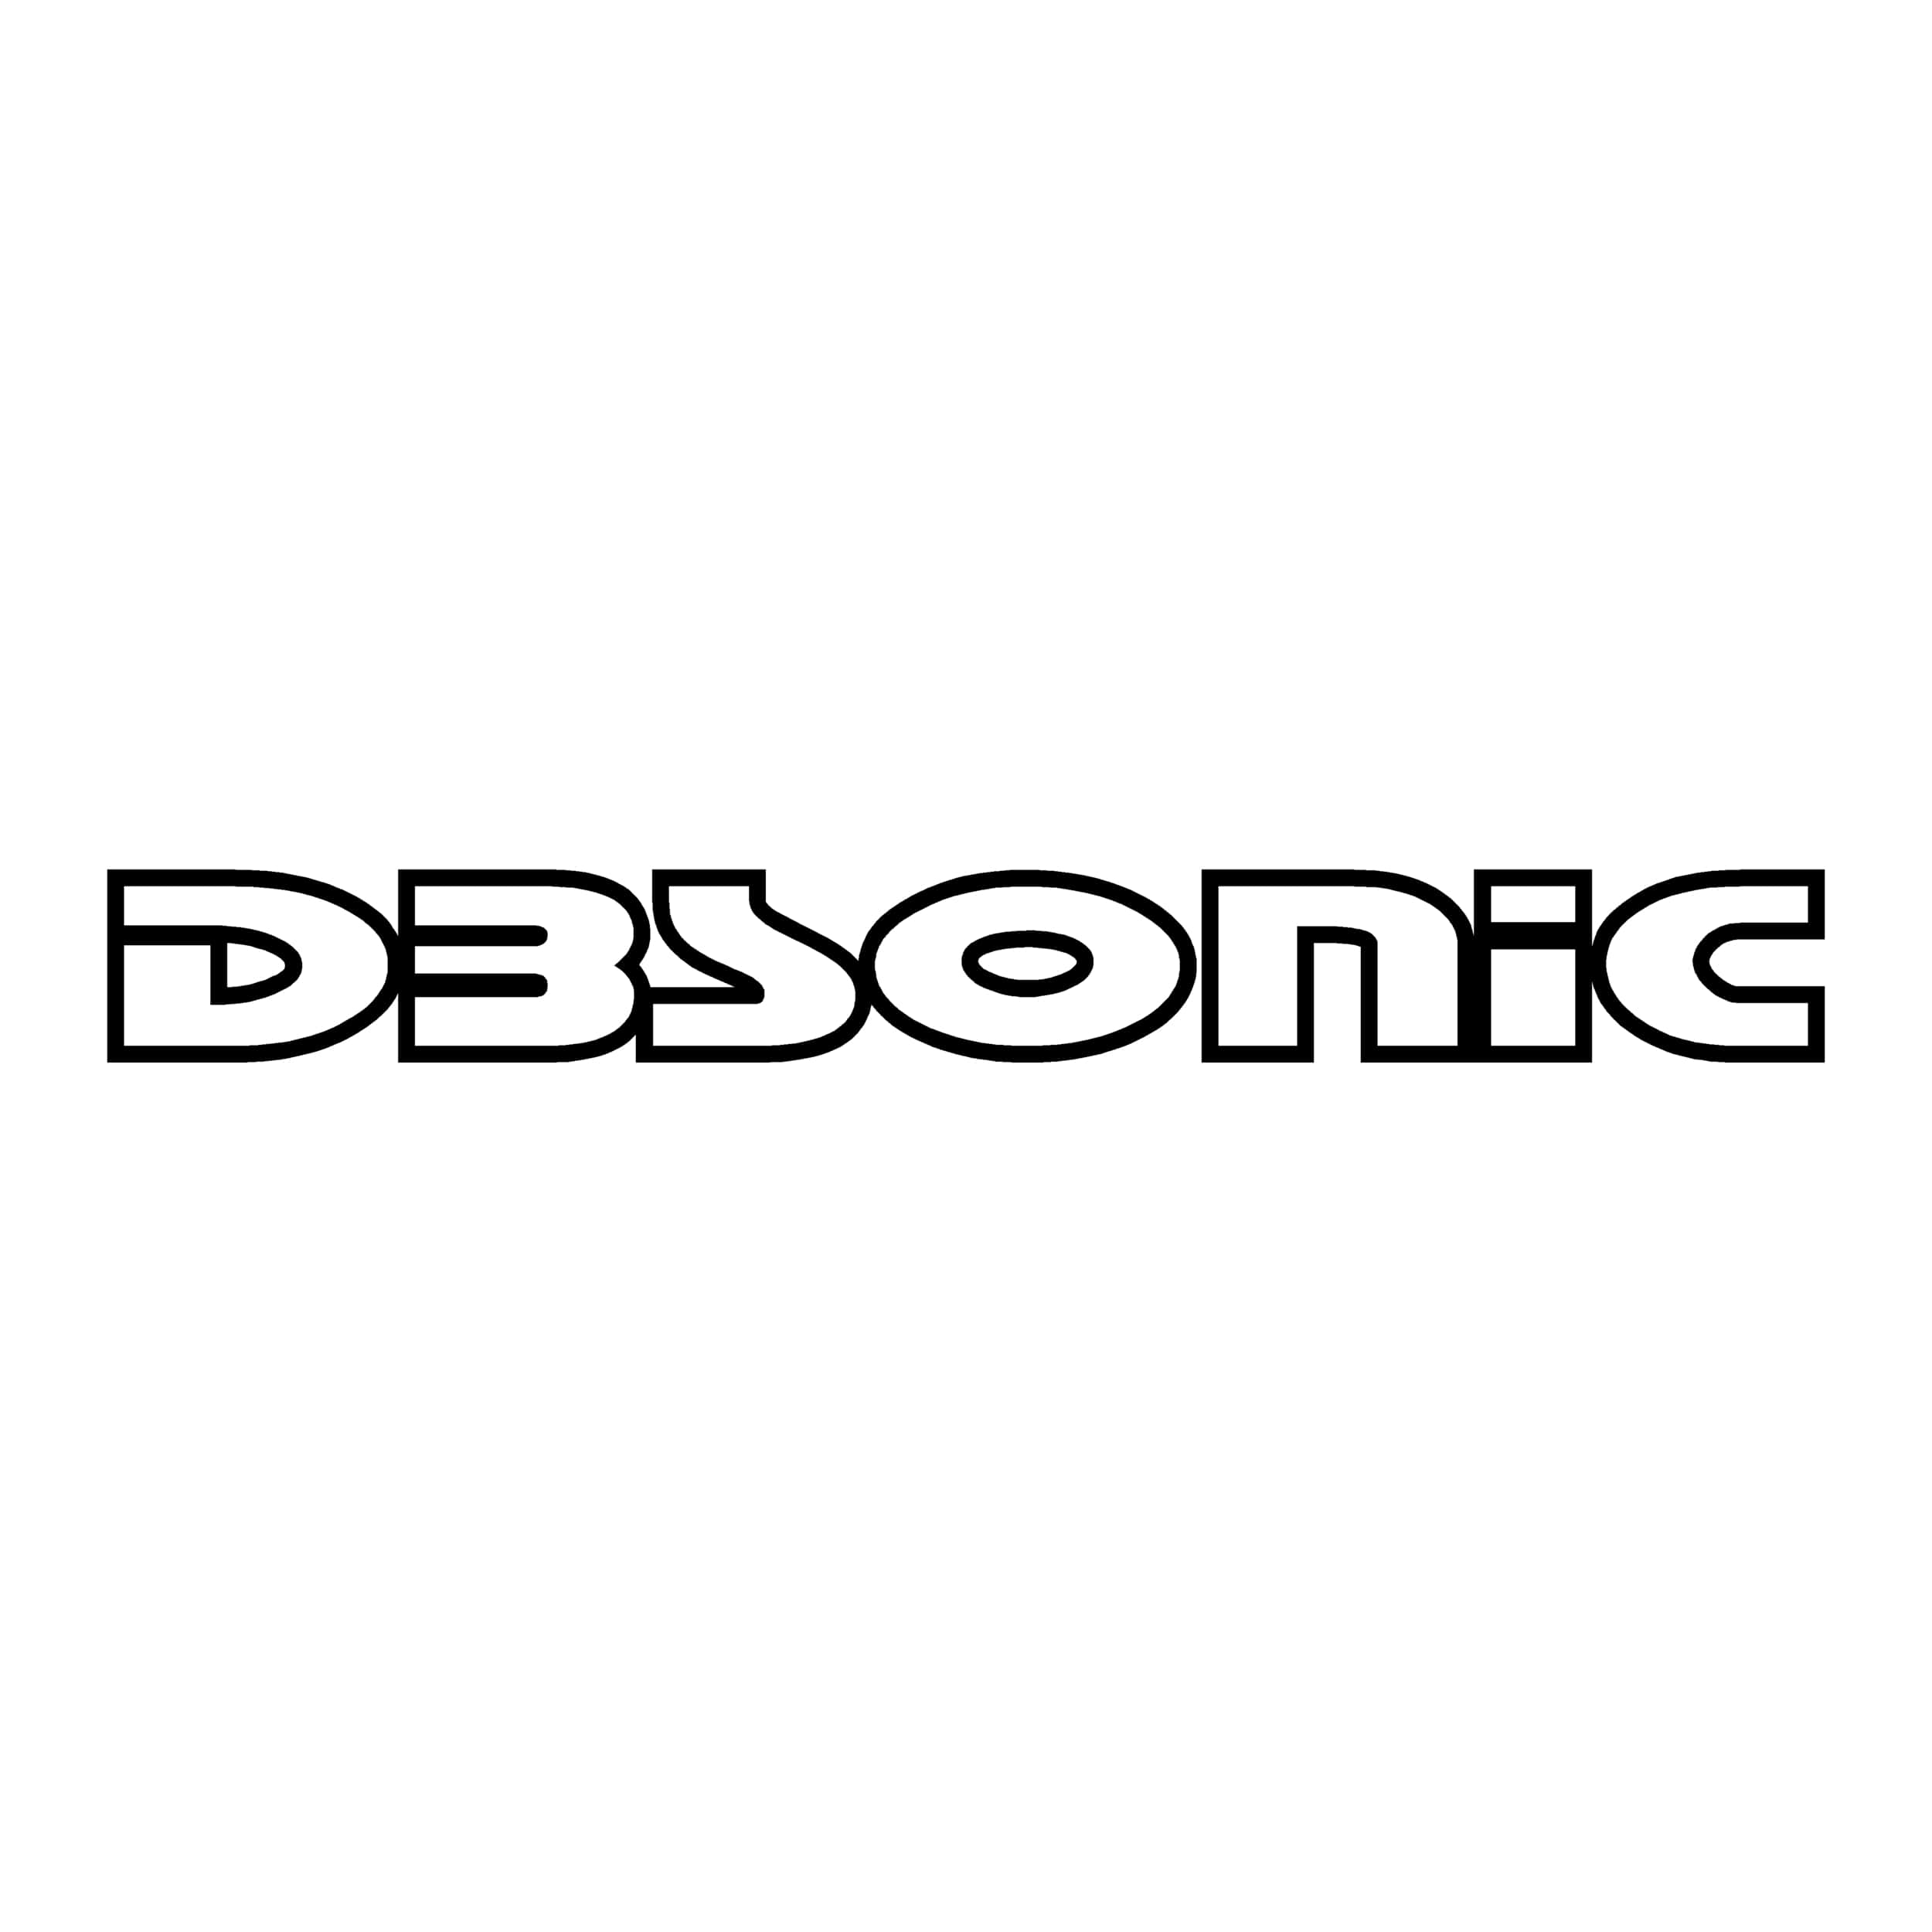 sticker-dbsonic-ref-2-tuning-audio-sonorisation-car-auto-moto-camion-competition-deco-rallye-autocollant-min